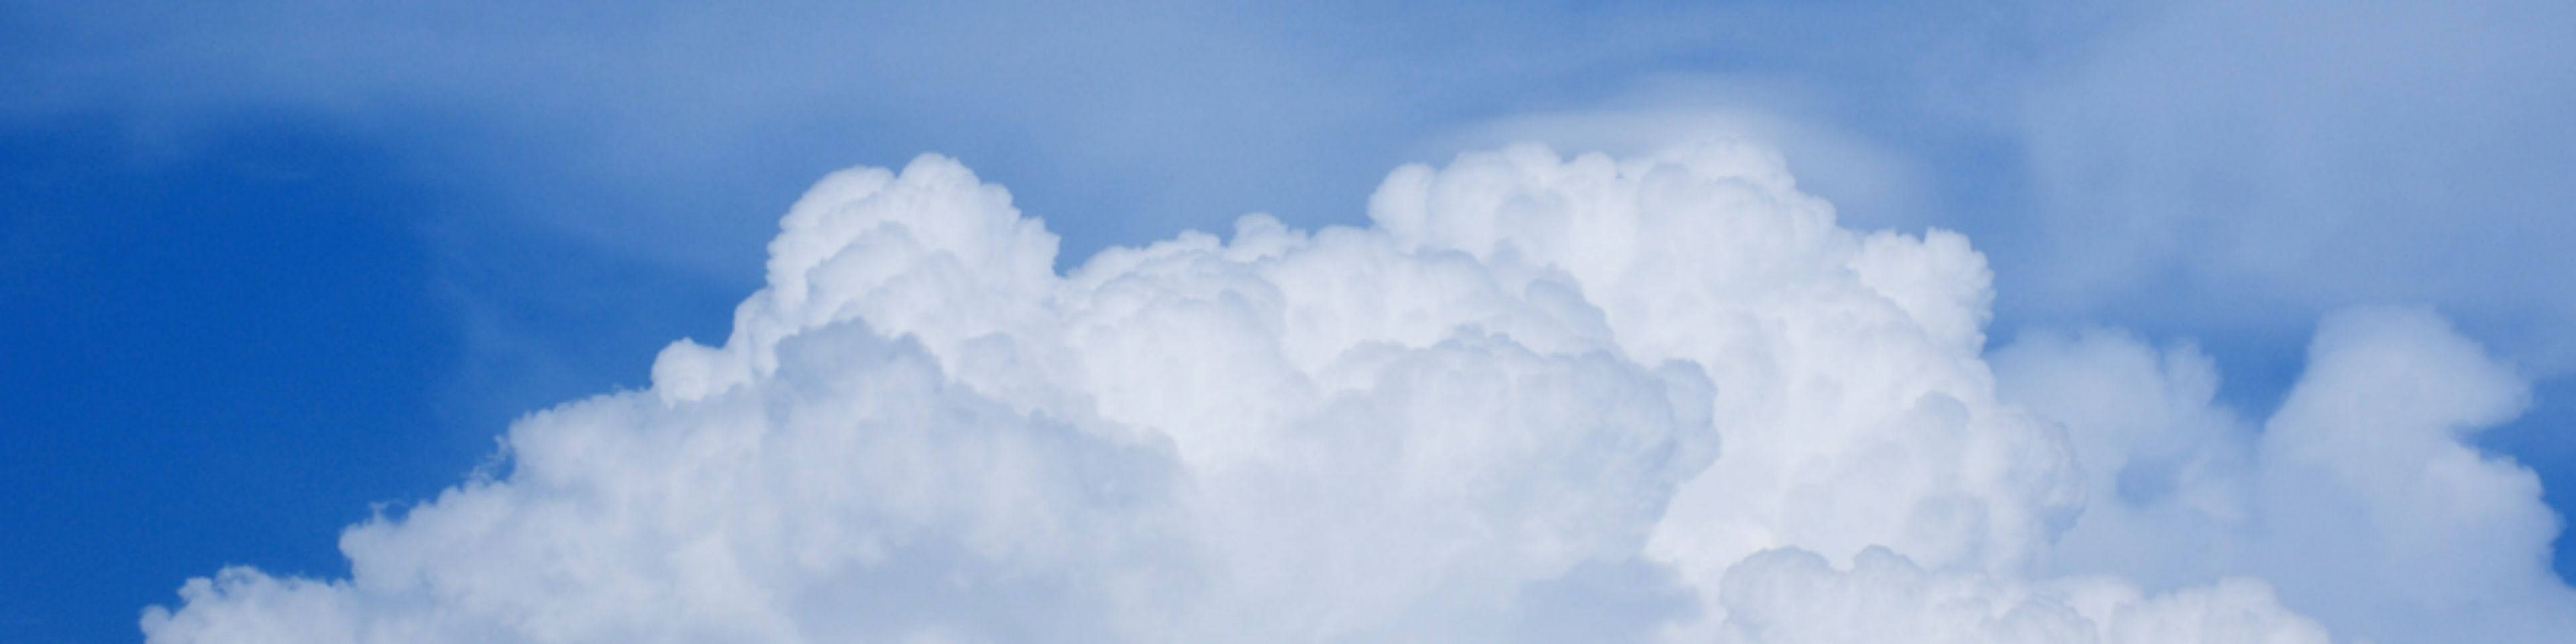 Kleos_cloud-based practice management software